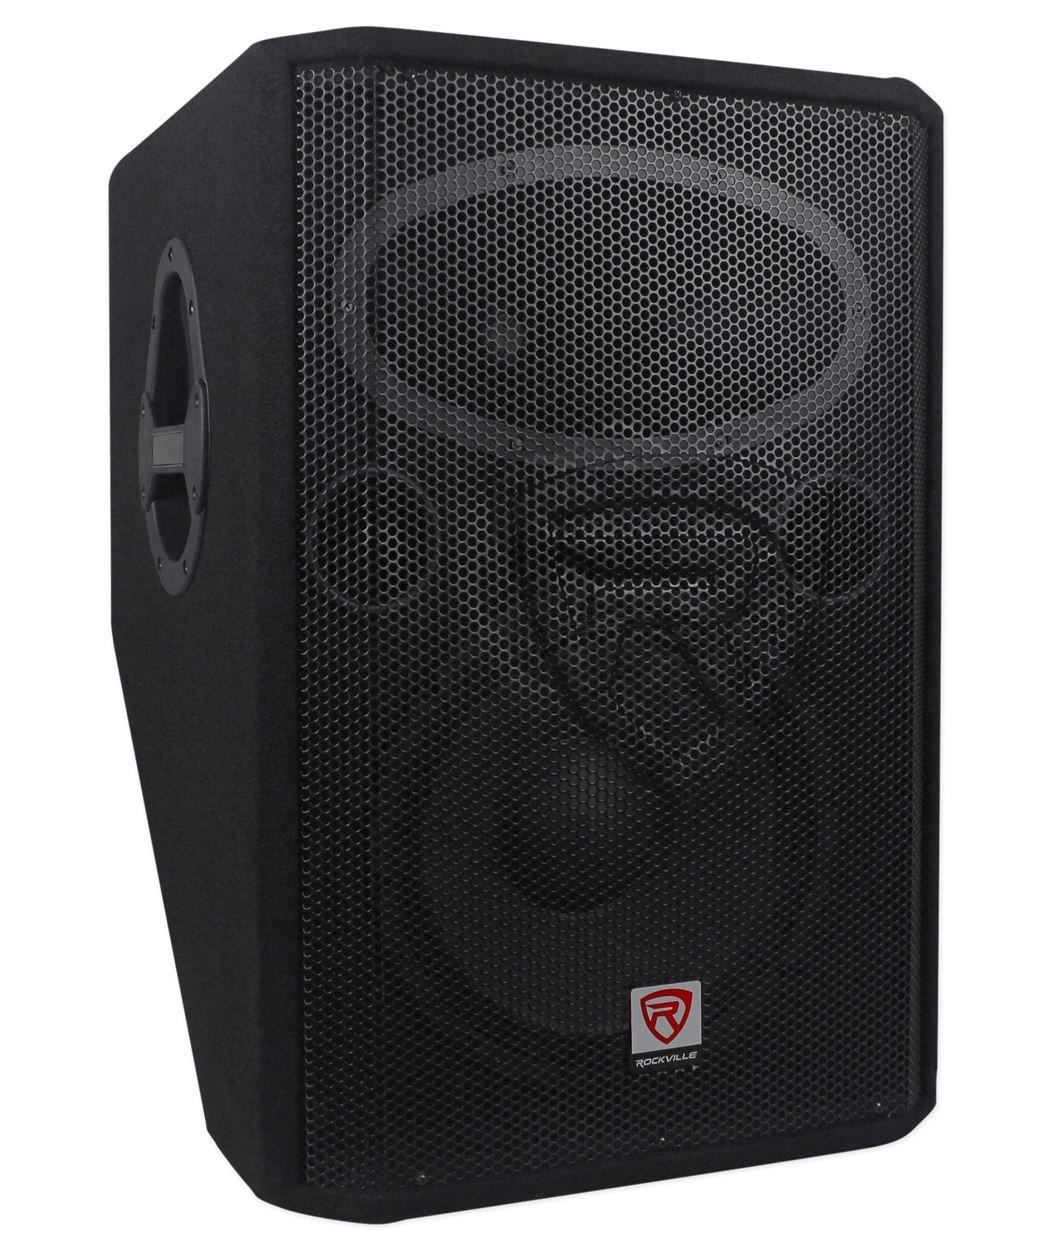 New Rockville RSM12P 12'' 1000 Watt 2-Way Passive Stage Floor Monitor Speaker by Rockville